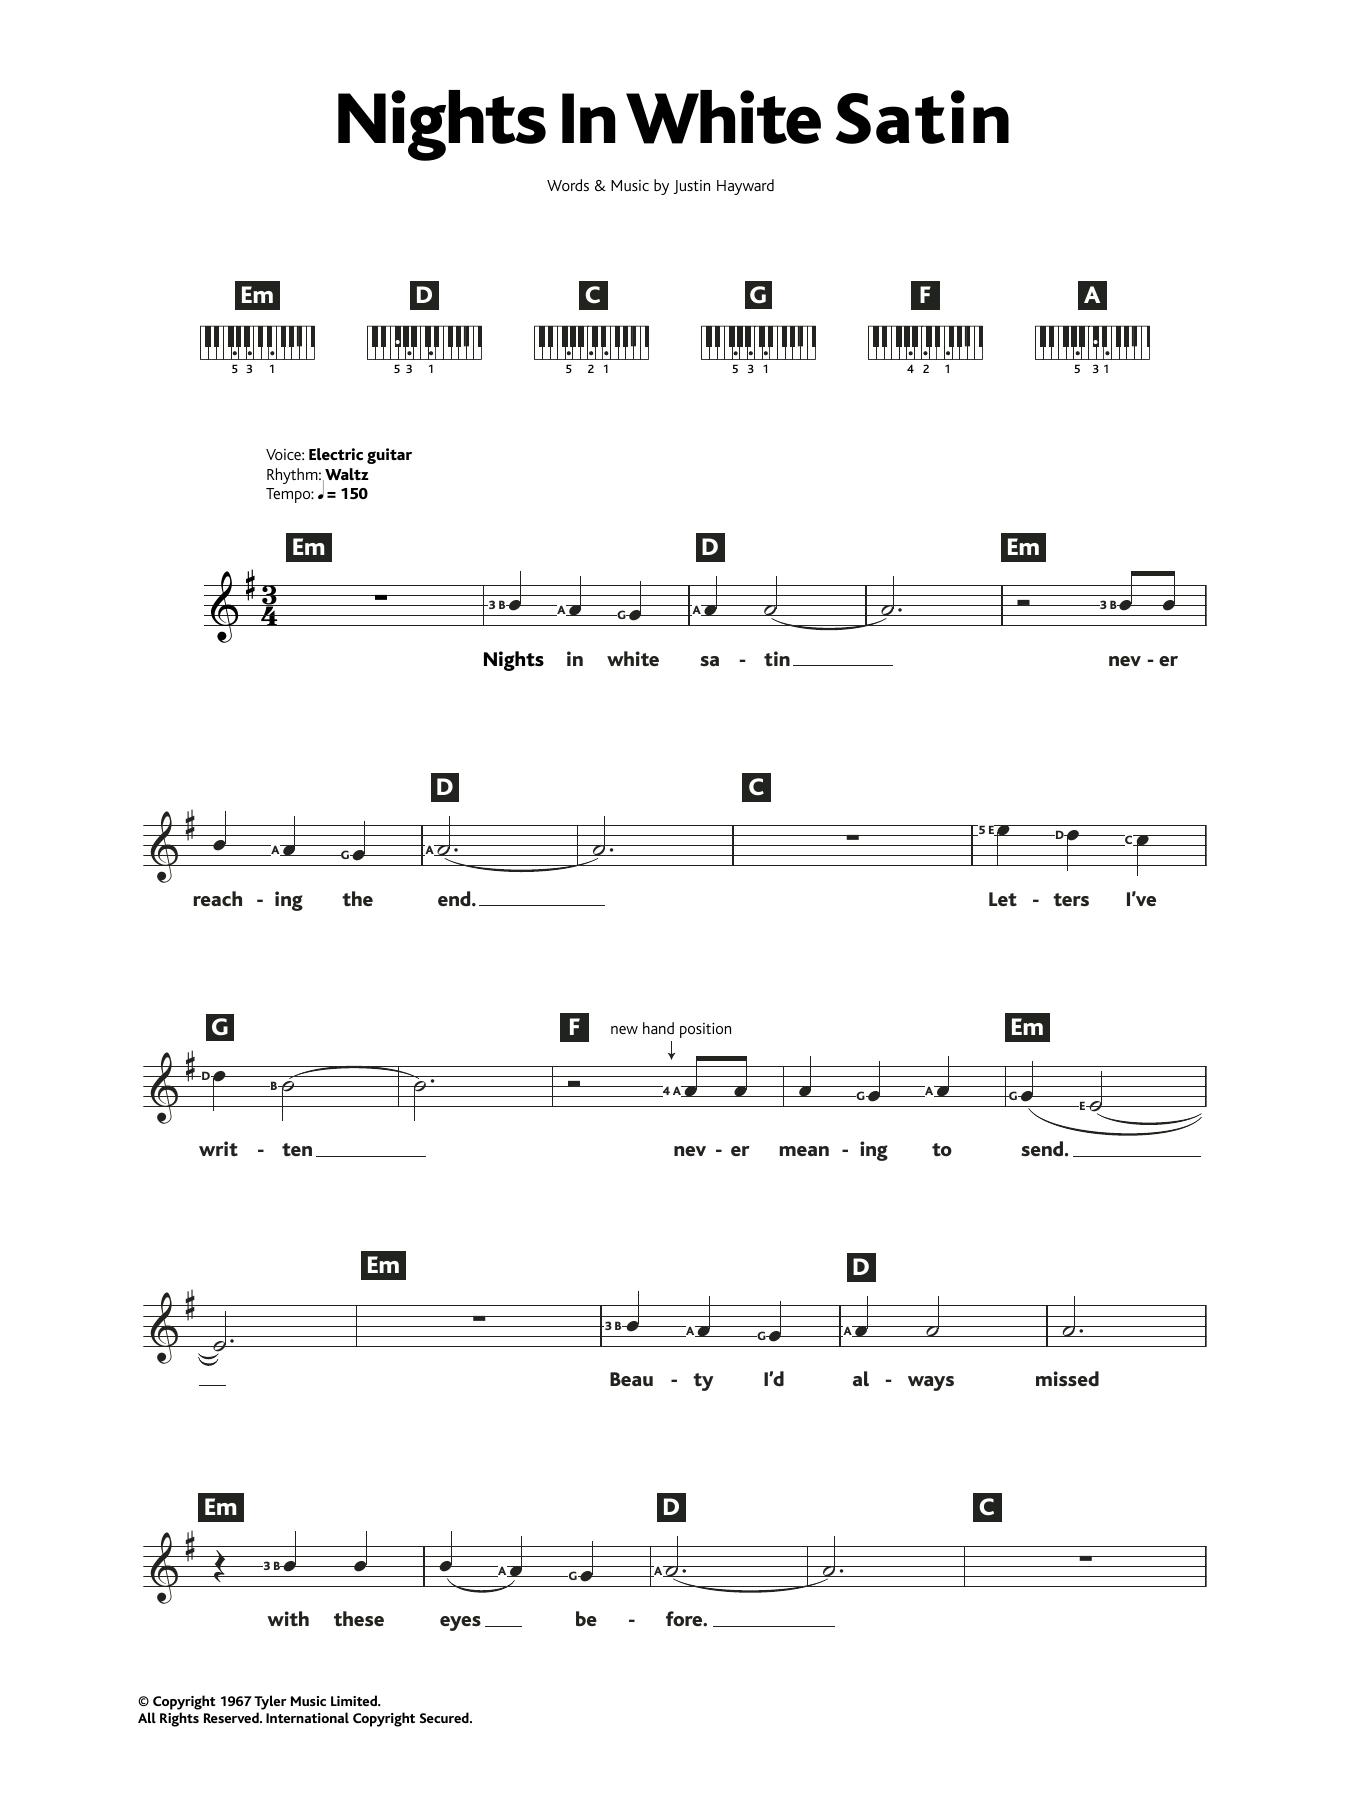 Nights In White Satin Sheet Music   The Moody Blues   Piano Chords/Lyrics